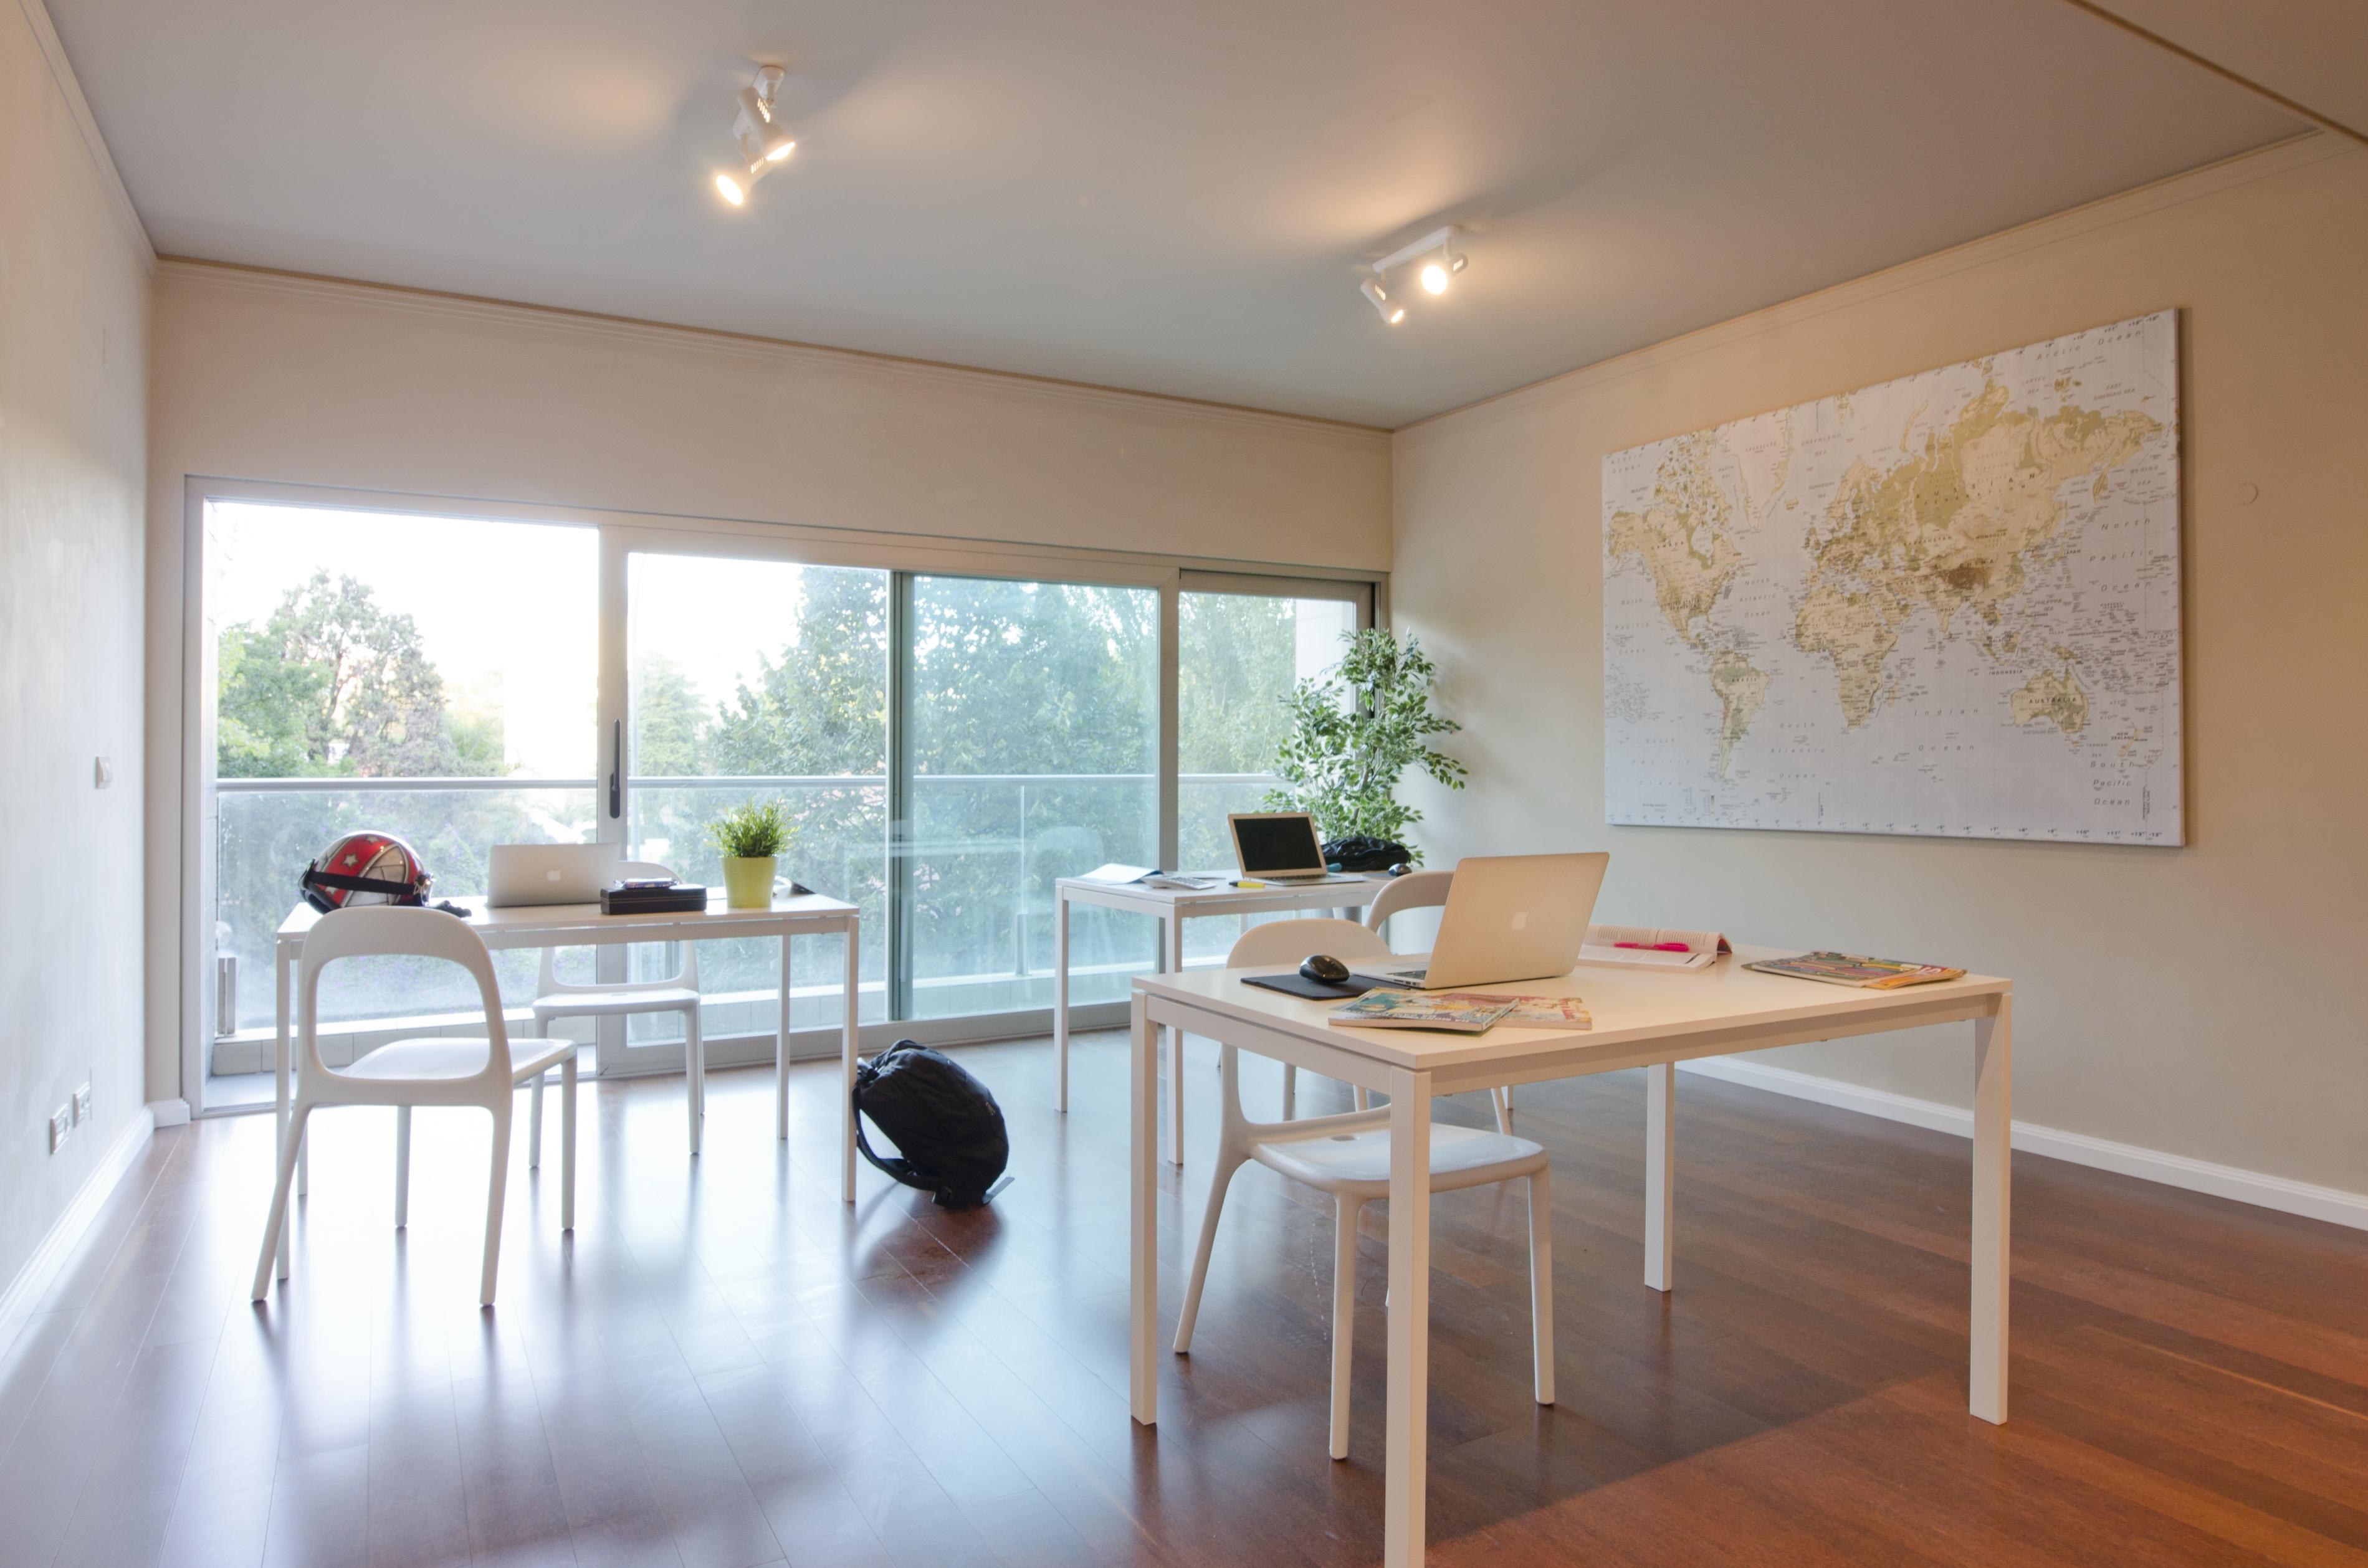 PE - Geral - Sala trabalhos. Working area - Foto 3.JPG